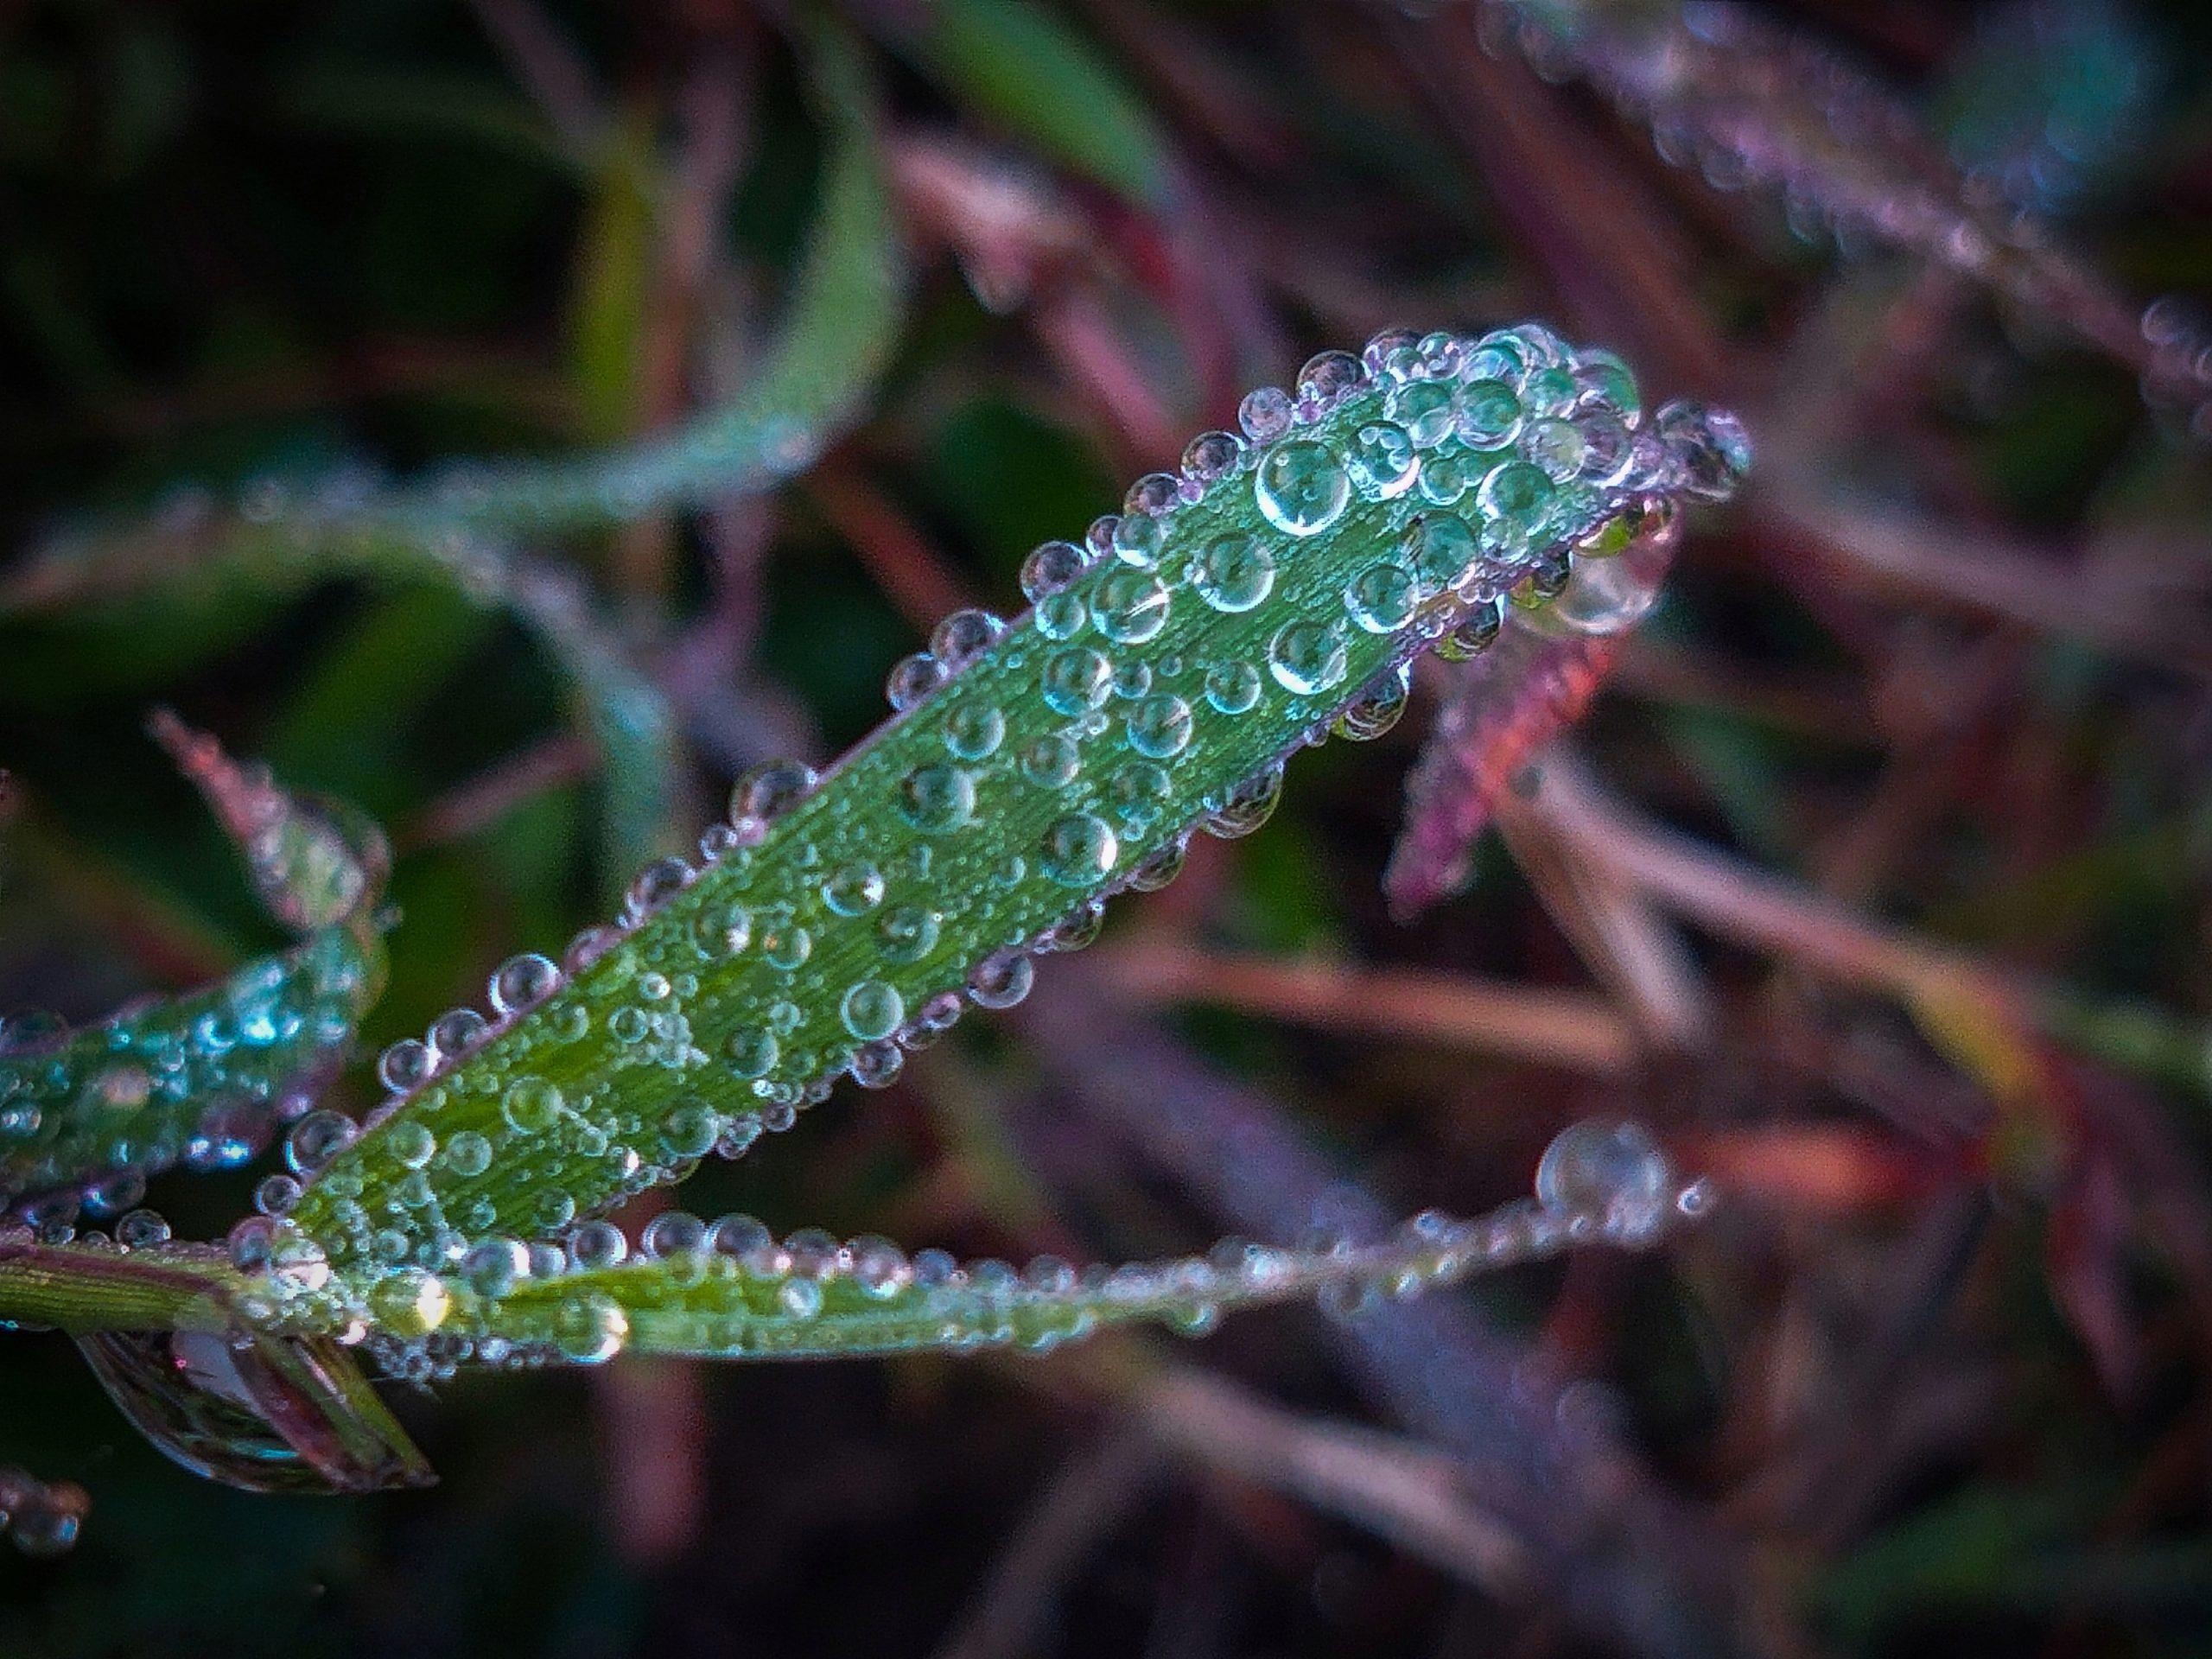 Dew droplets on a leaf